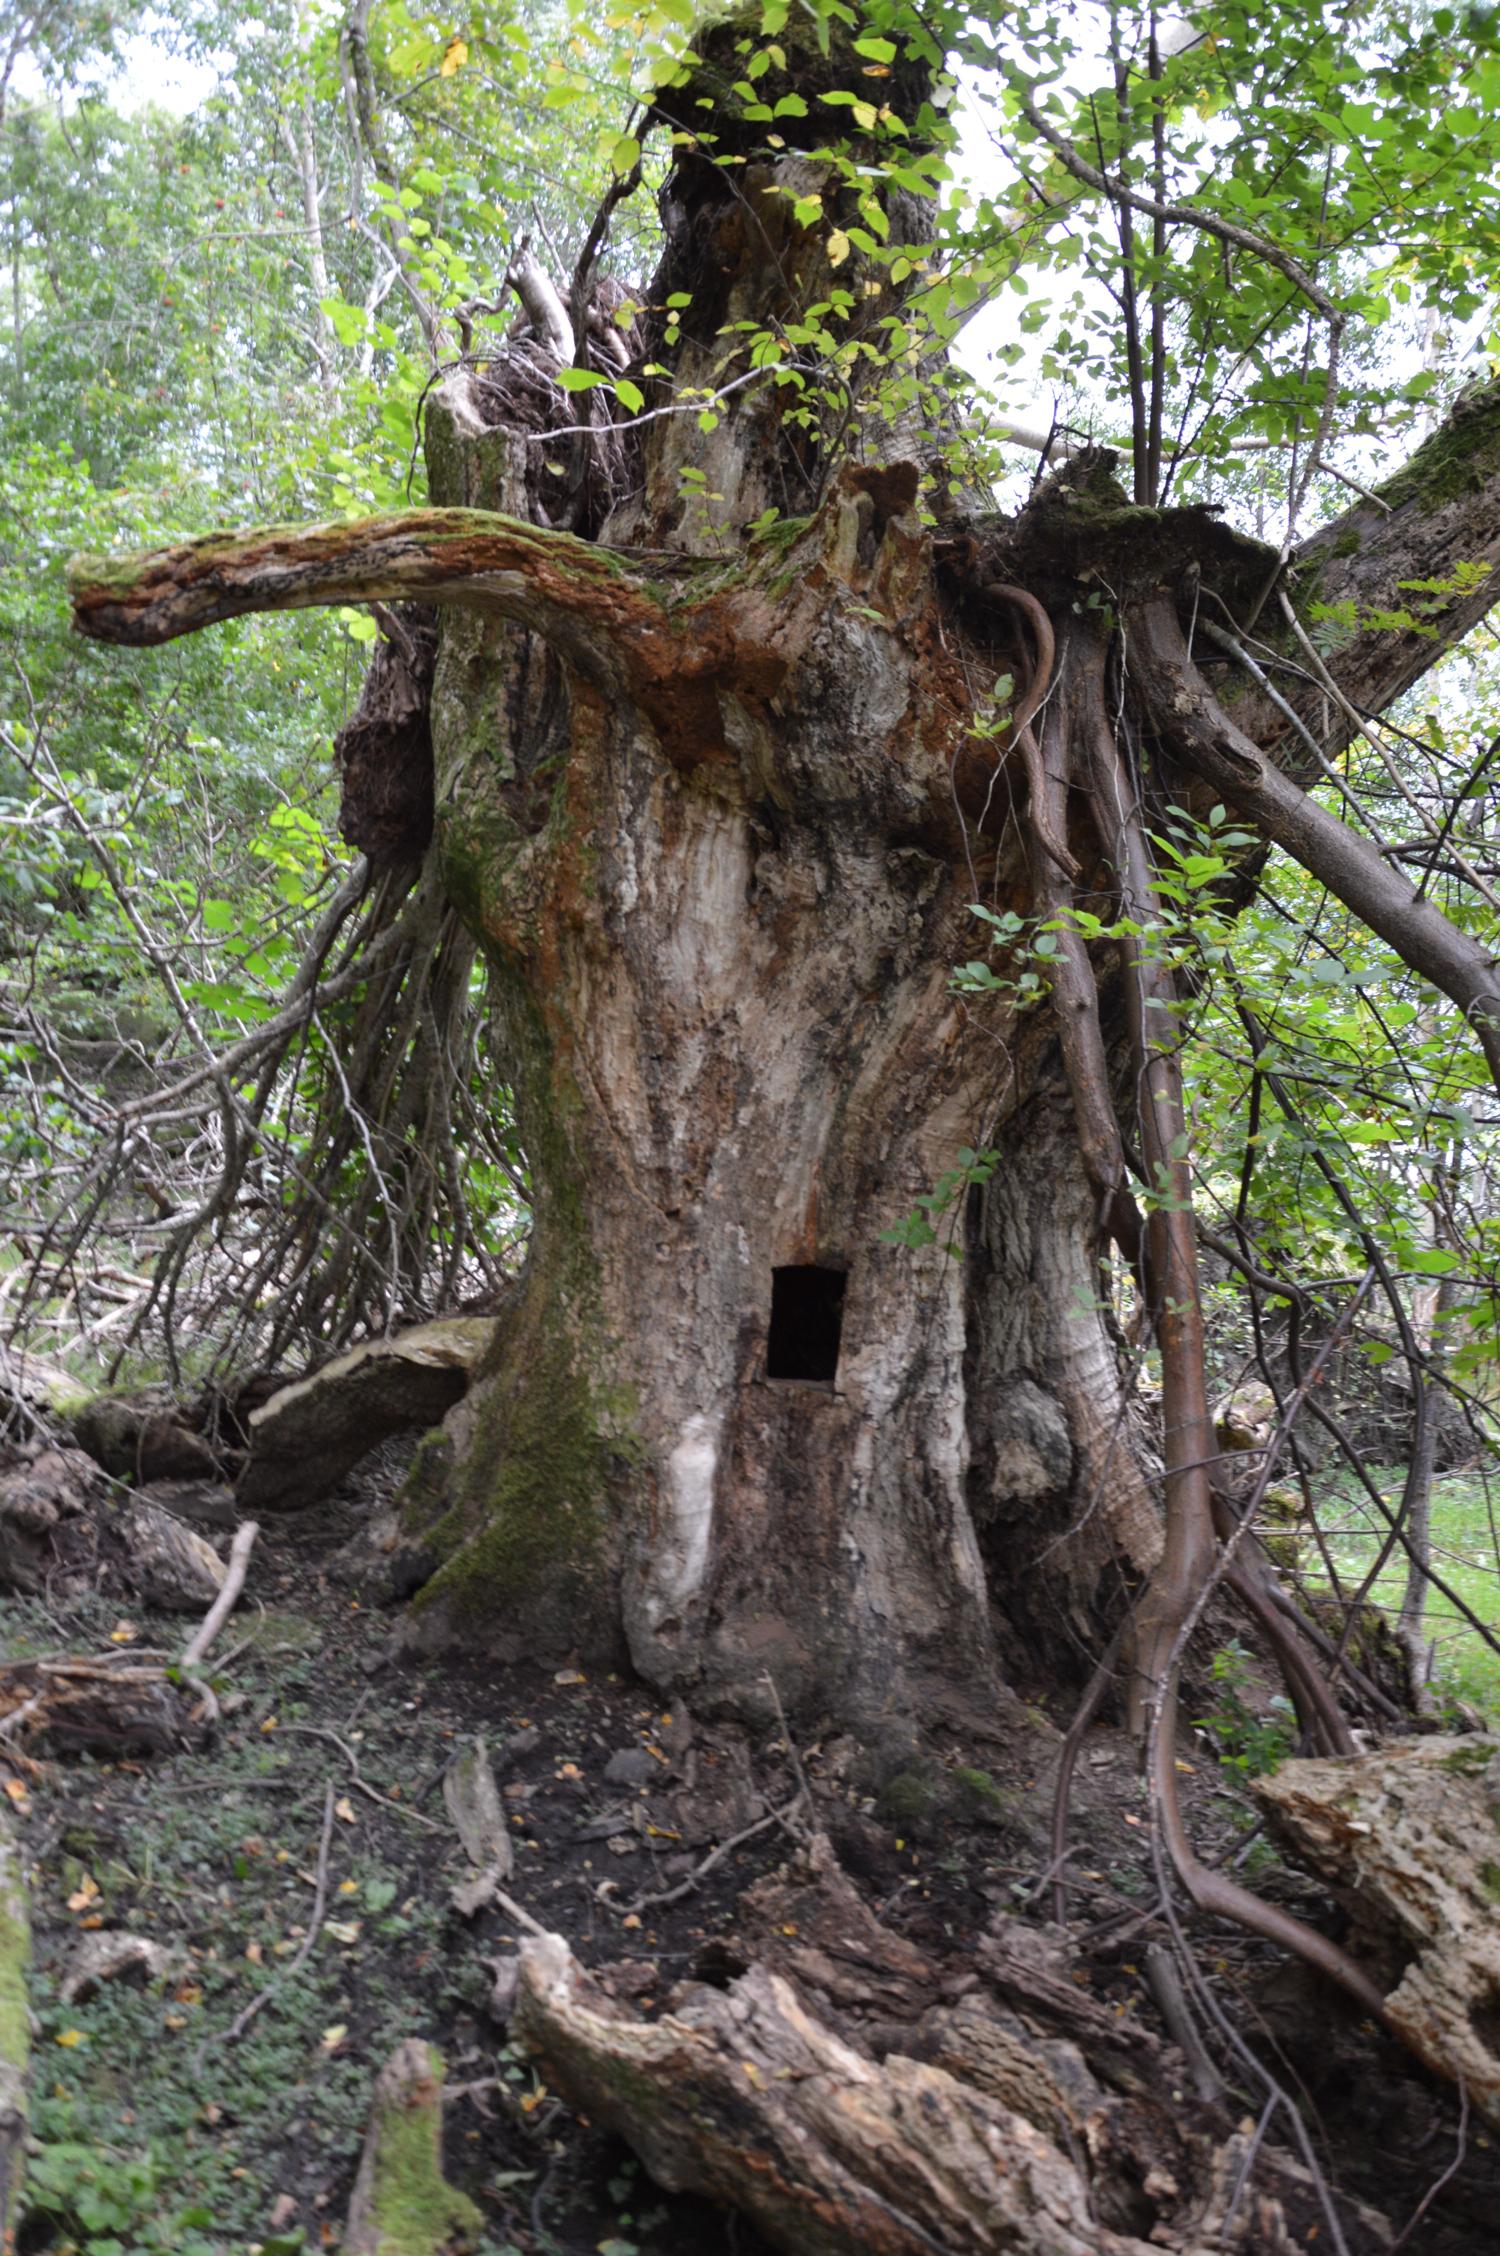 Inni dette gamle treet hadde Tjerand telefonen sin.